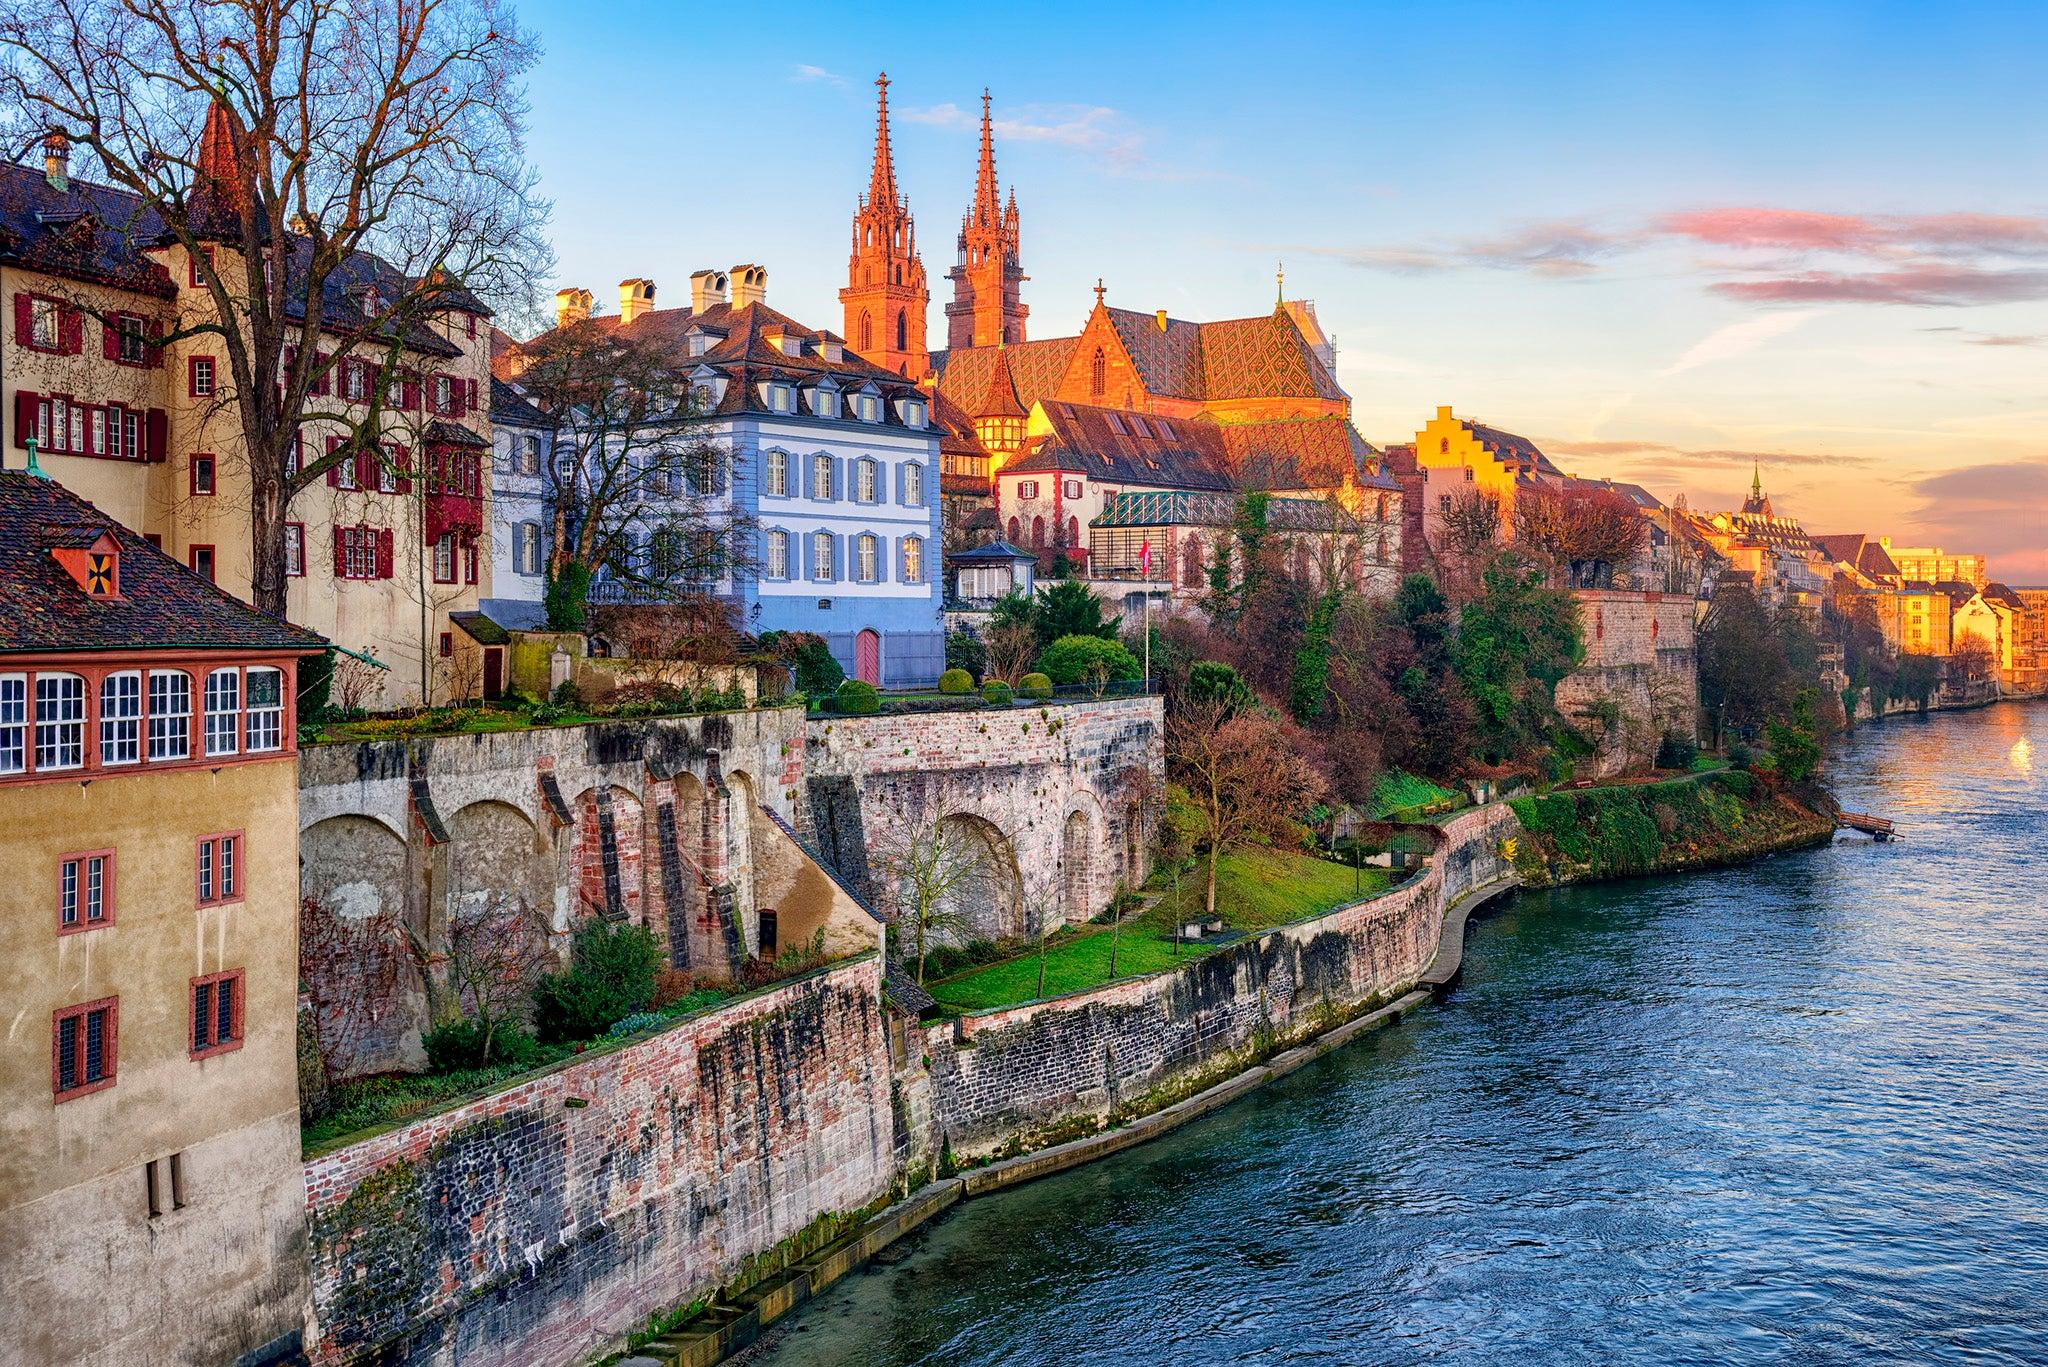 10. Basel, Switzerland